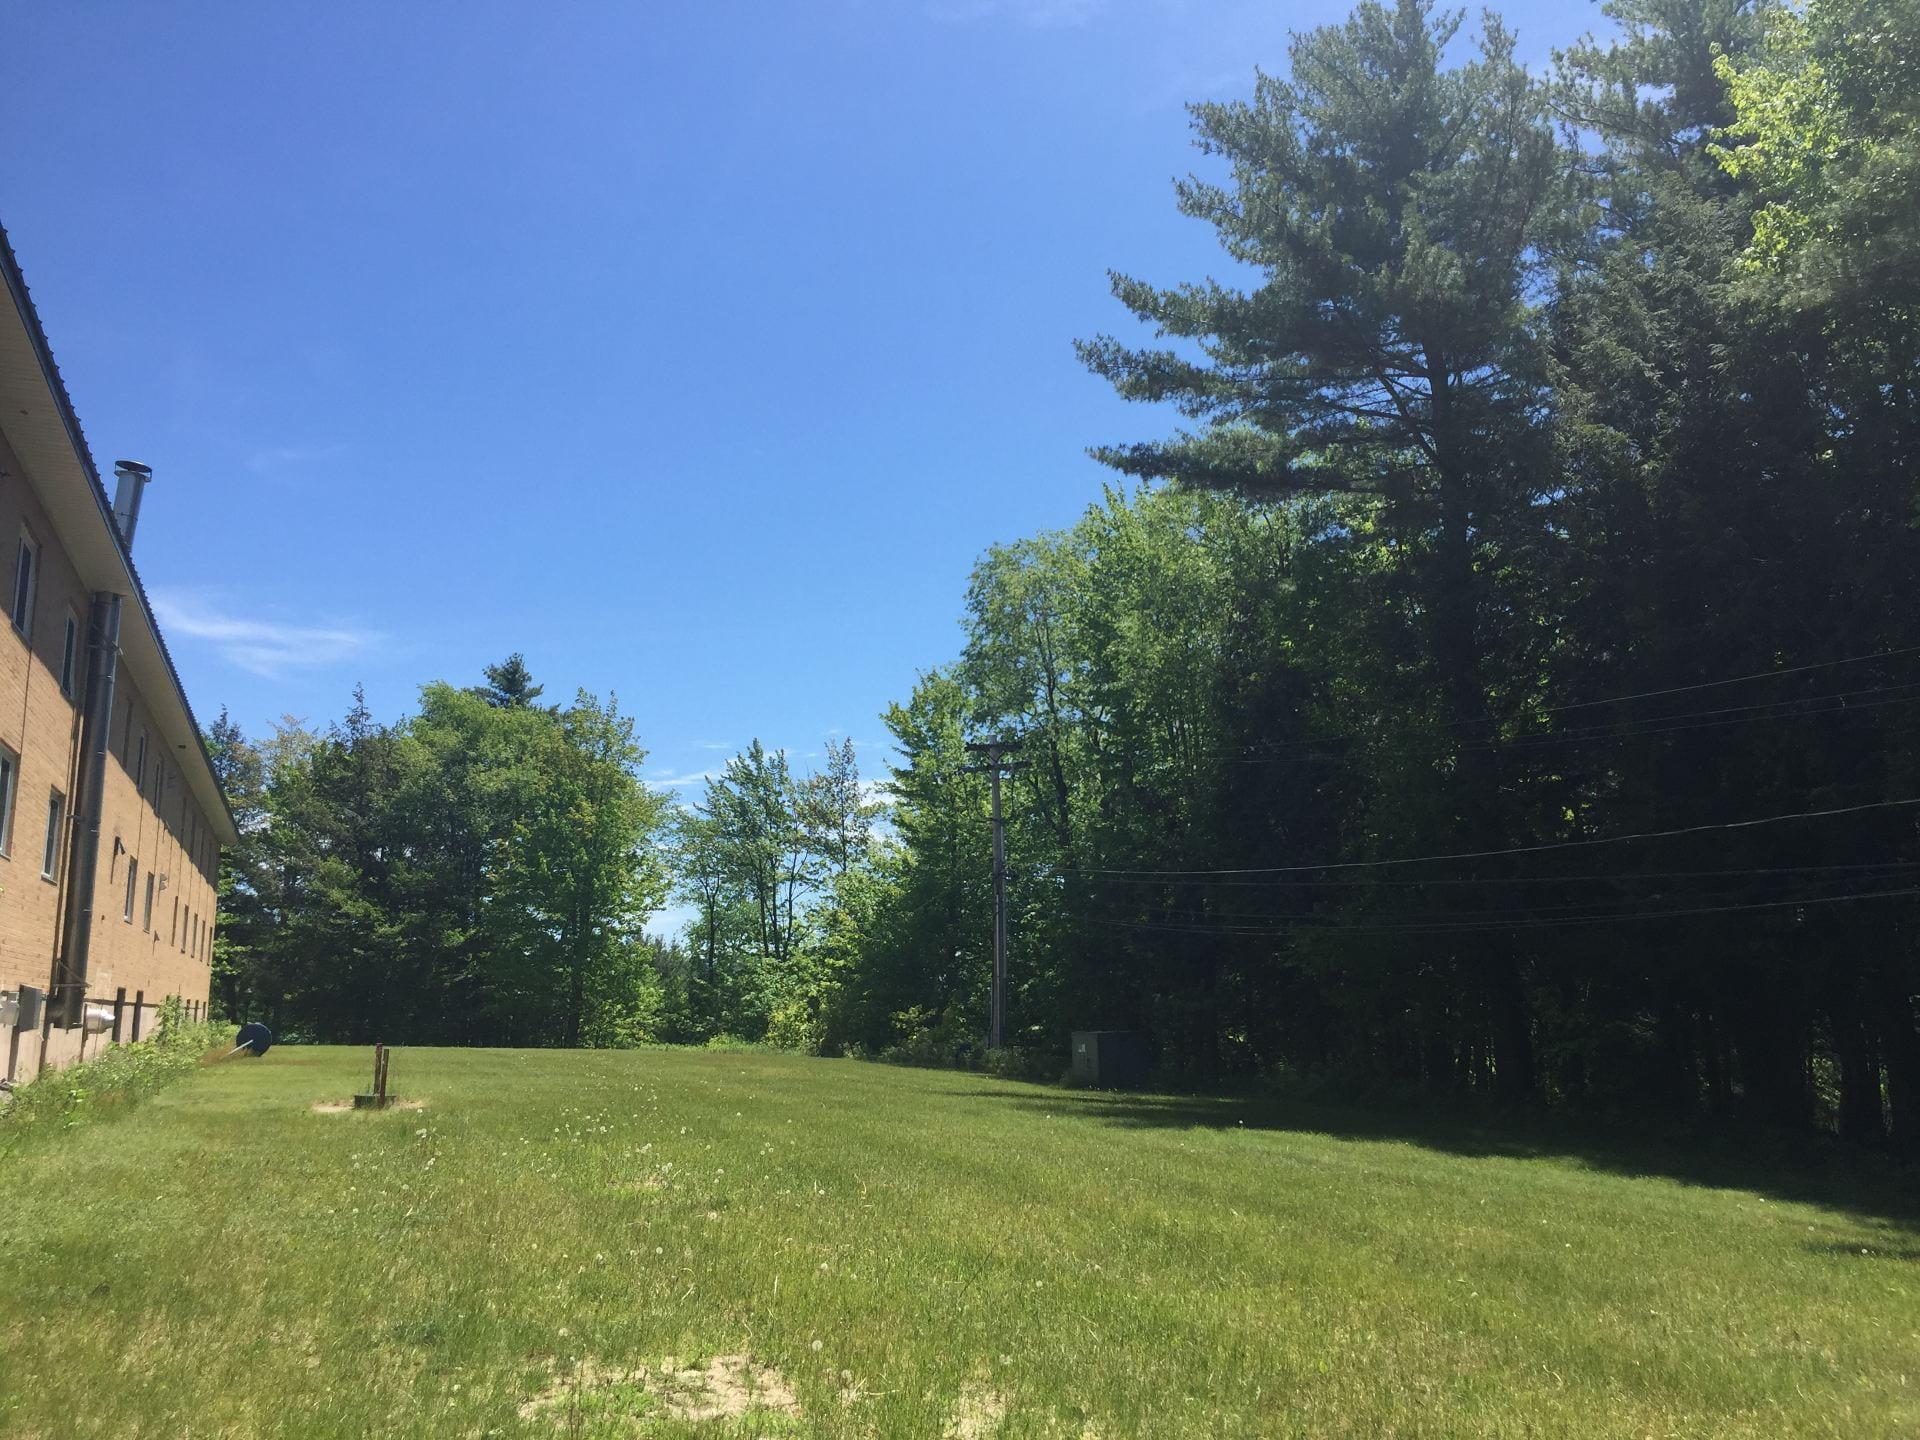 Saratoga Backyard Space